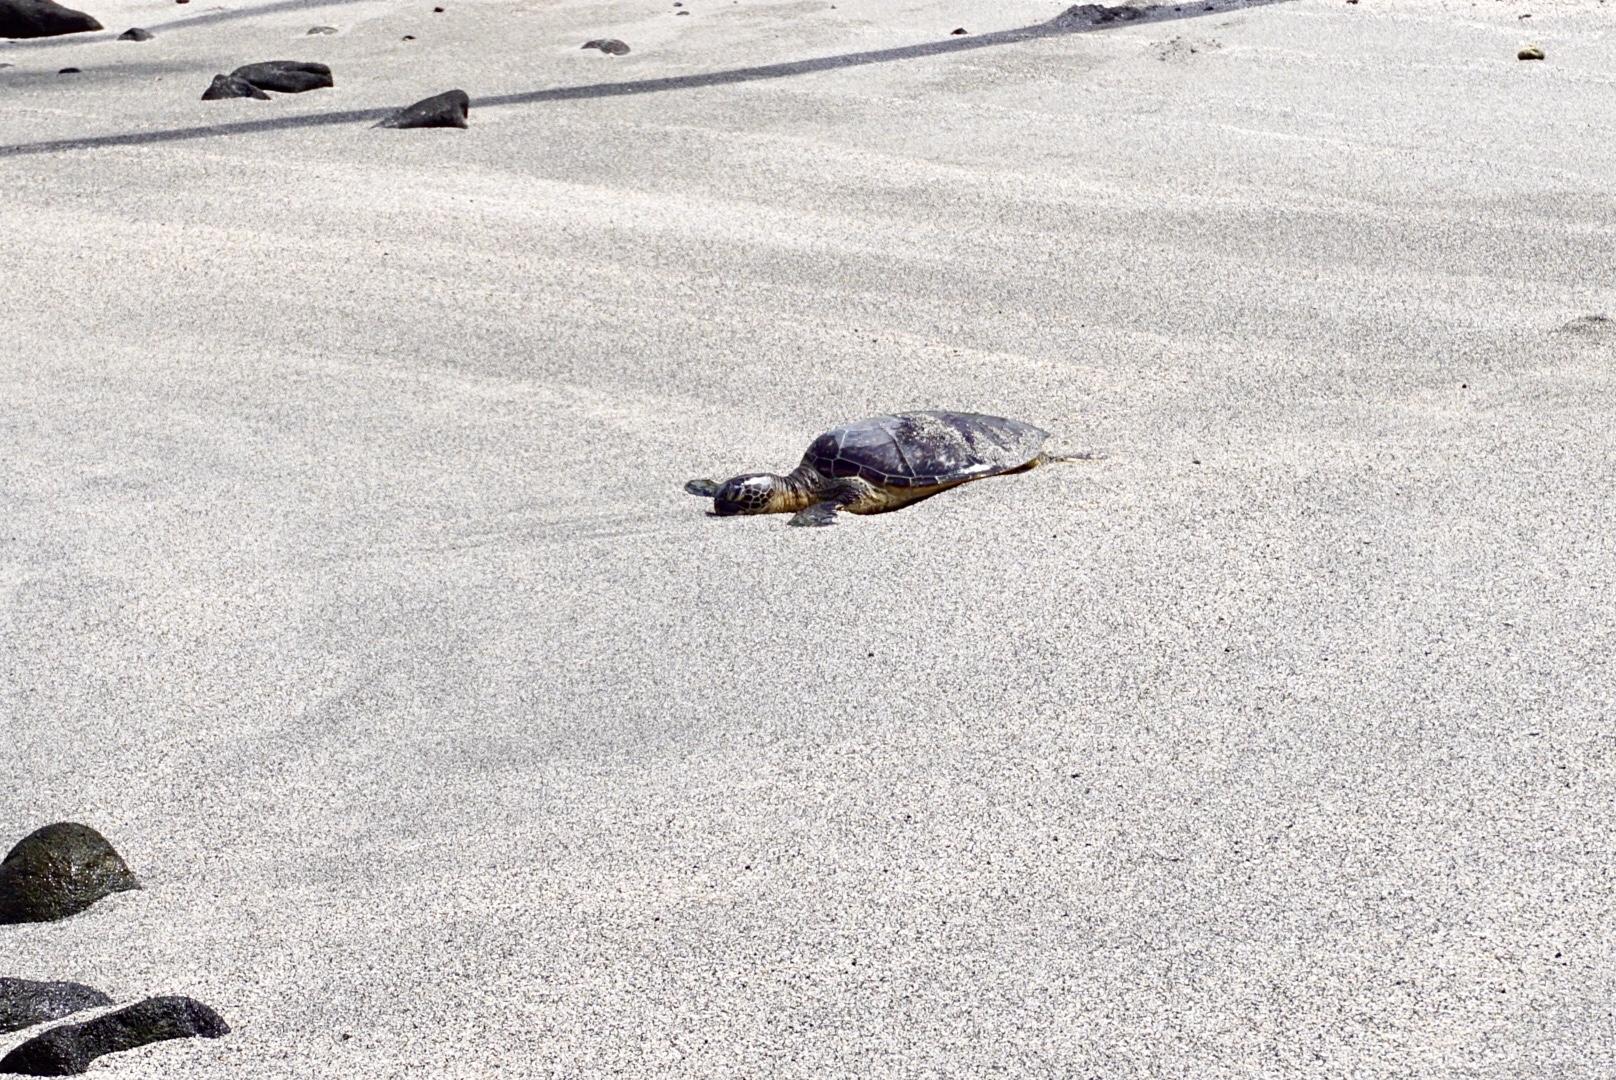 Sea turtle at Pu'uhonua O Hōnaunau National Historical Park on the Big Island of Hawaii